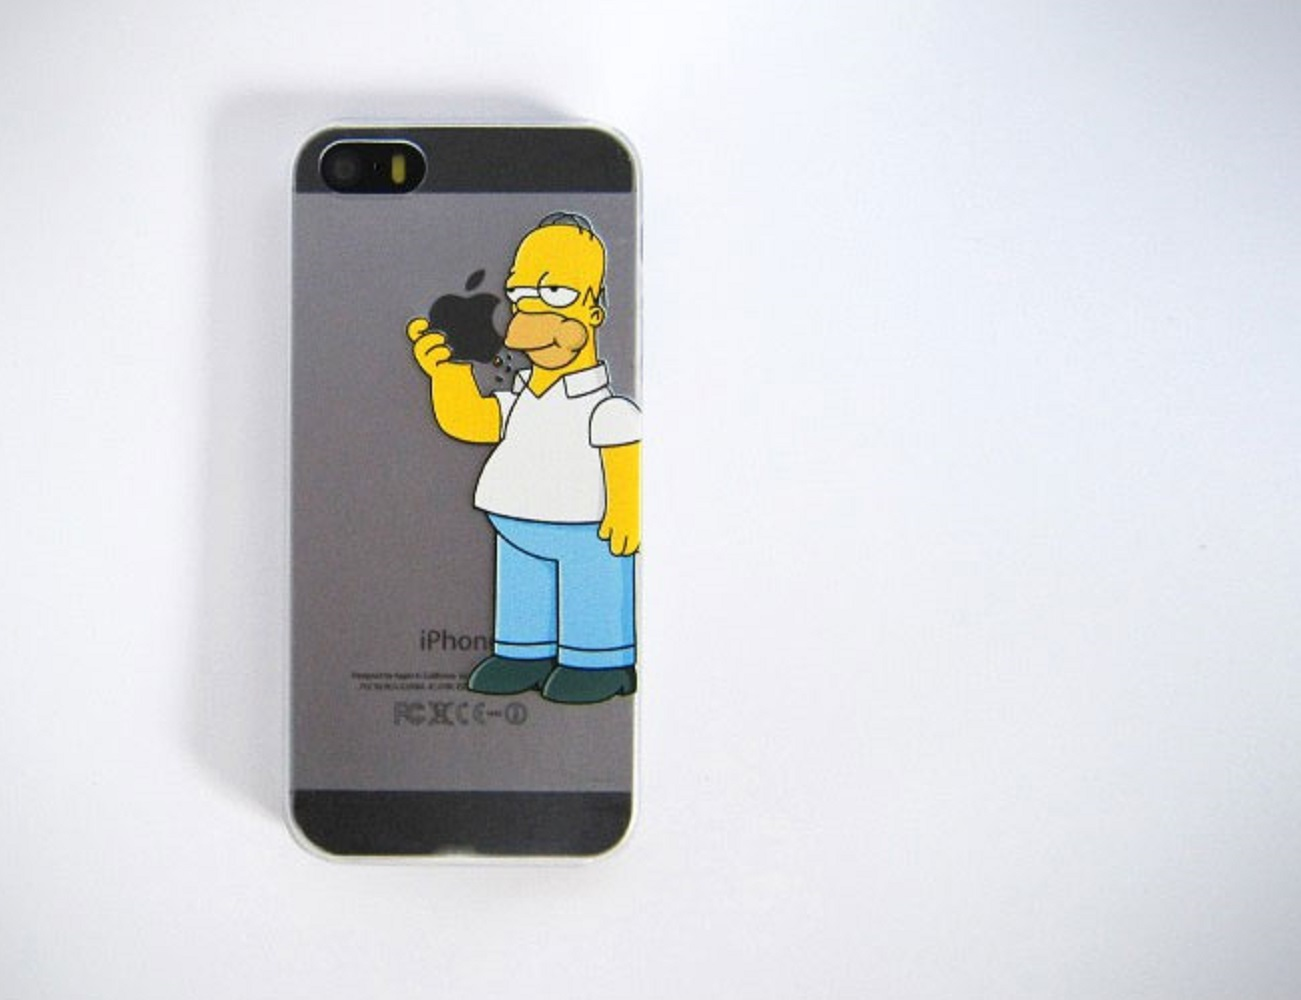 Homer iPhone 6 / 6 Plus Decal Sticker